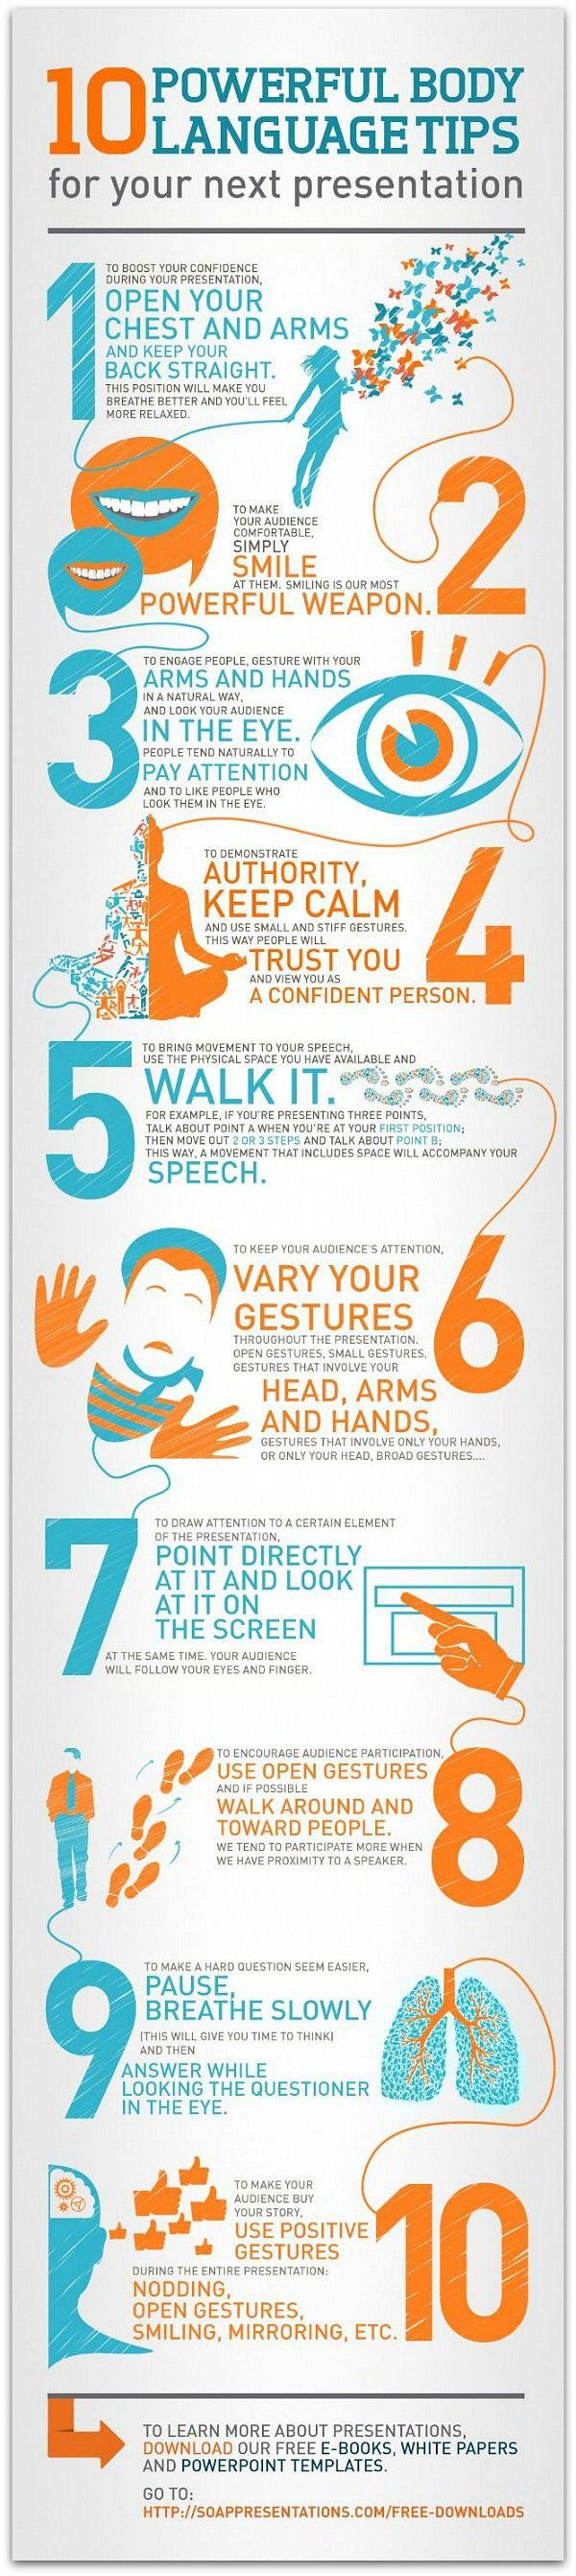 Body_Language_Tips_Infographic